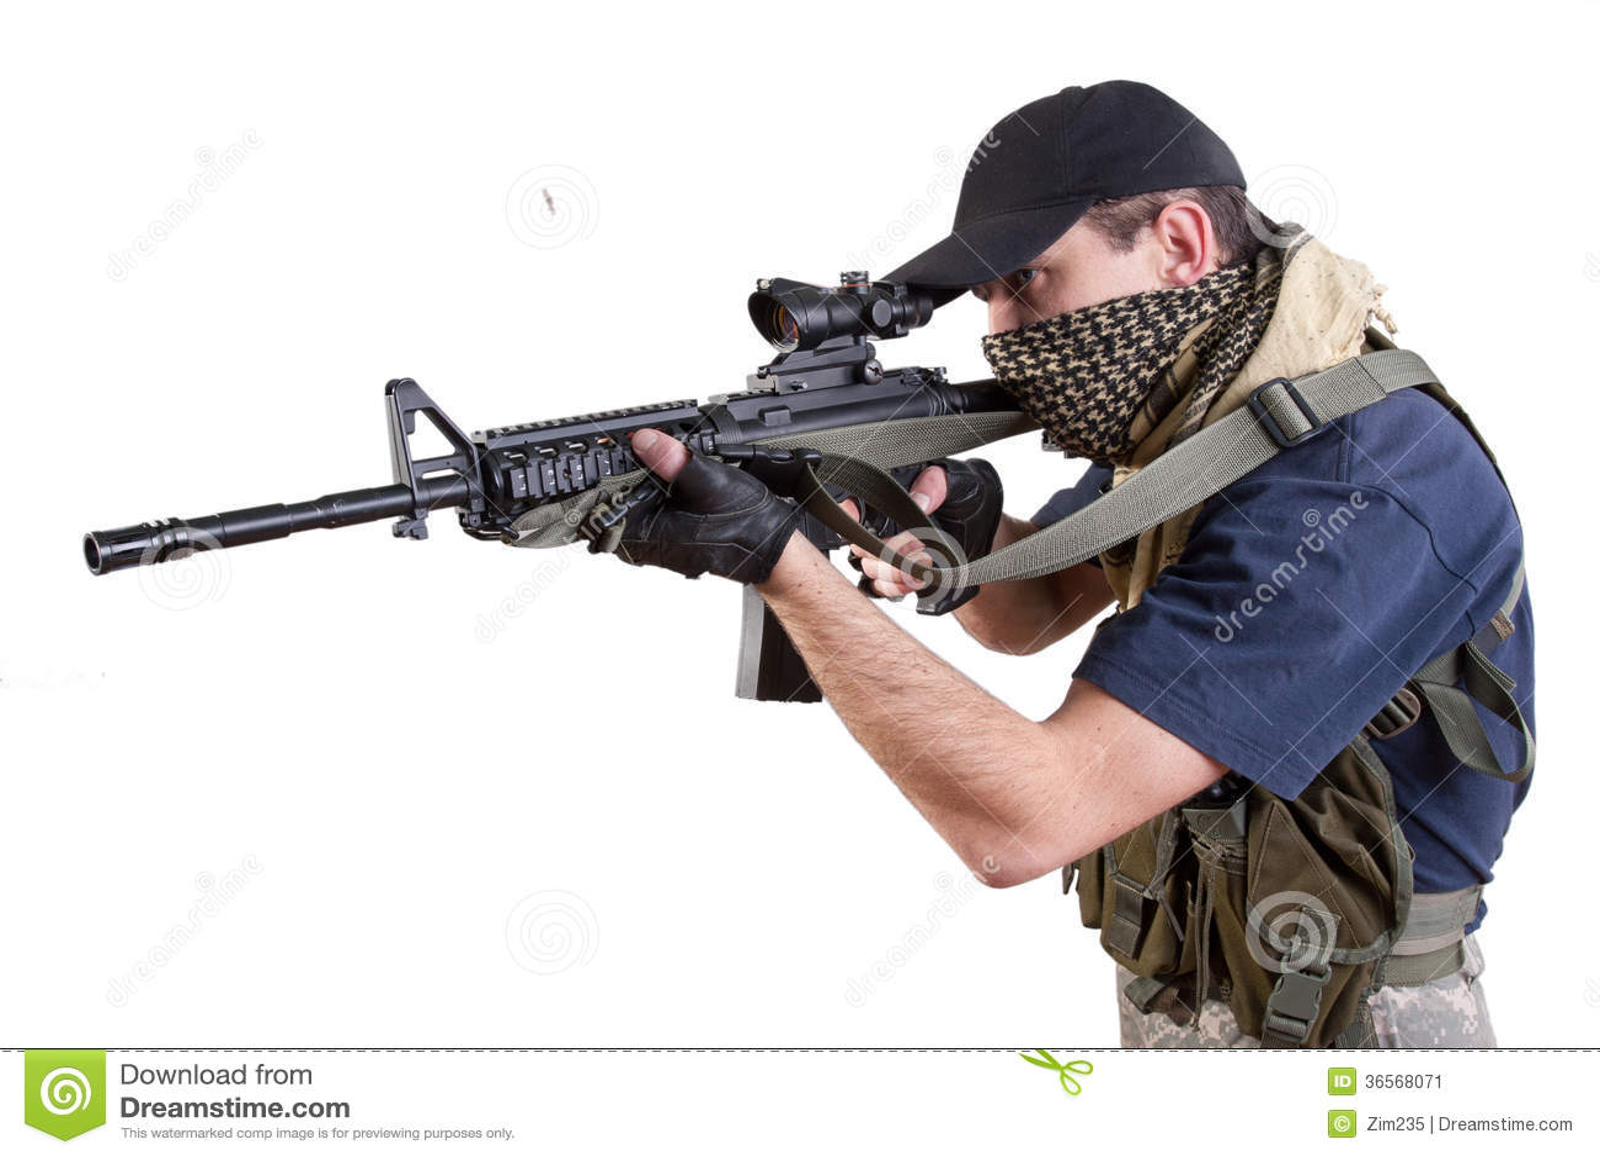 Pistol 3d Wallpaper Mercenary Private Security Contractor Stock Image